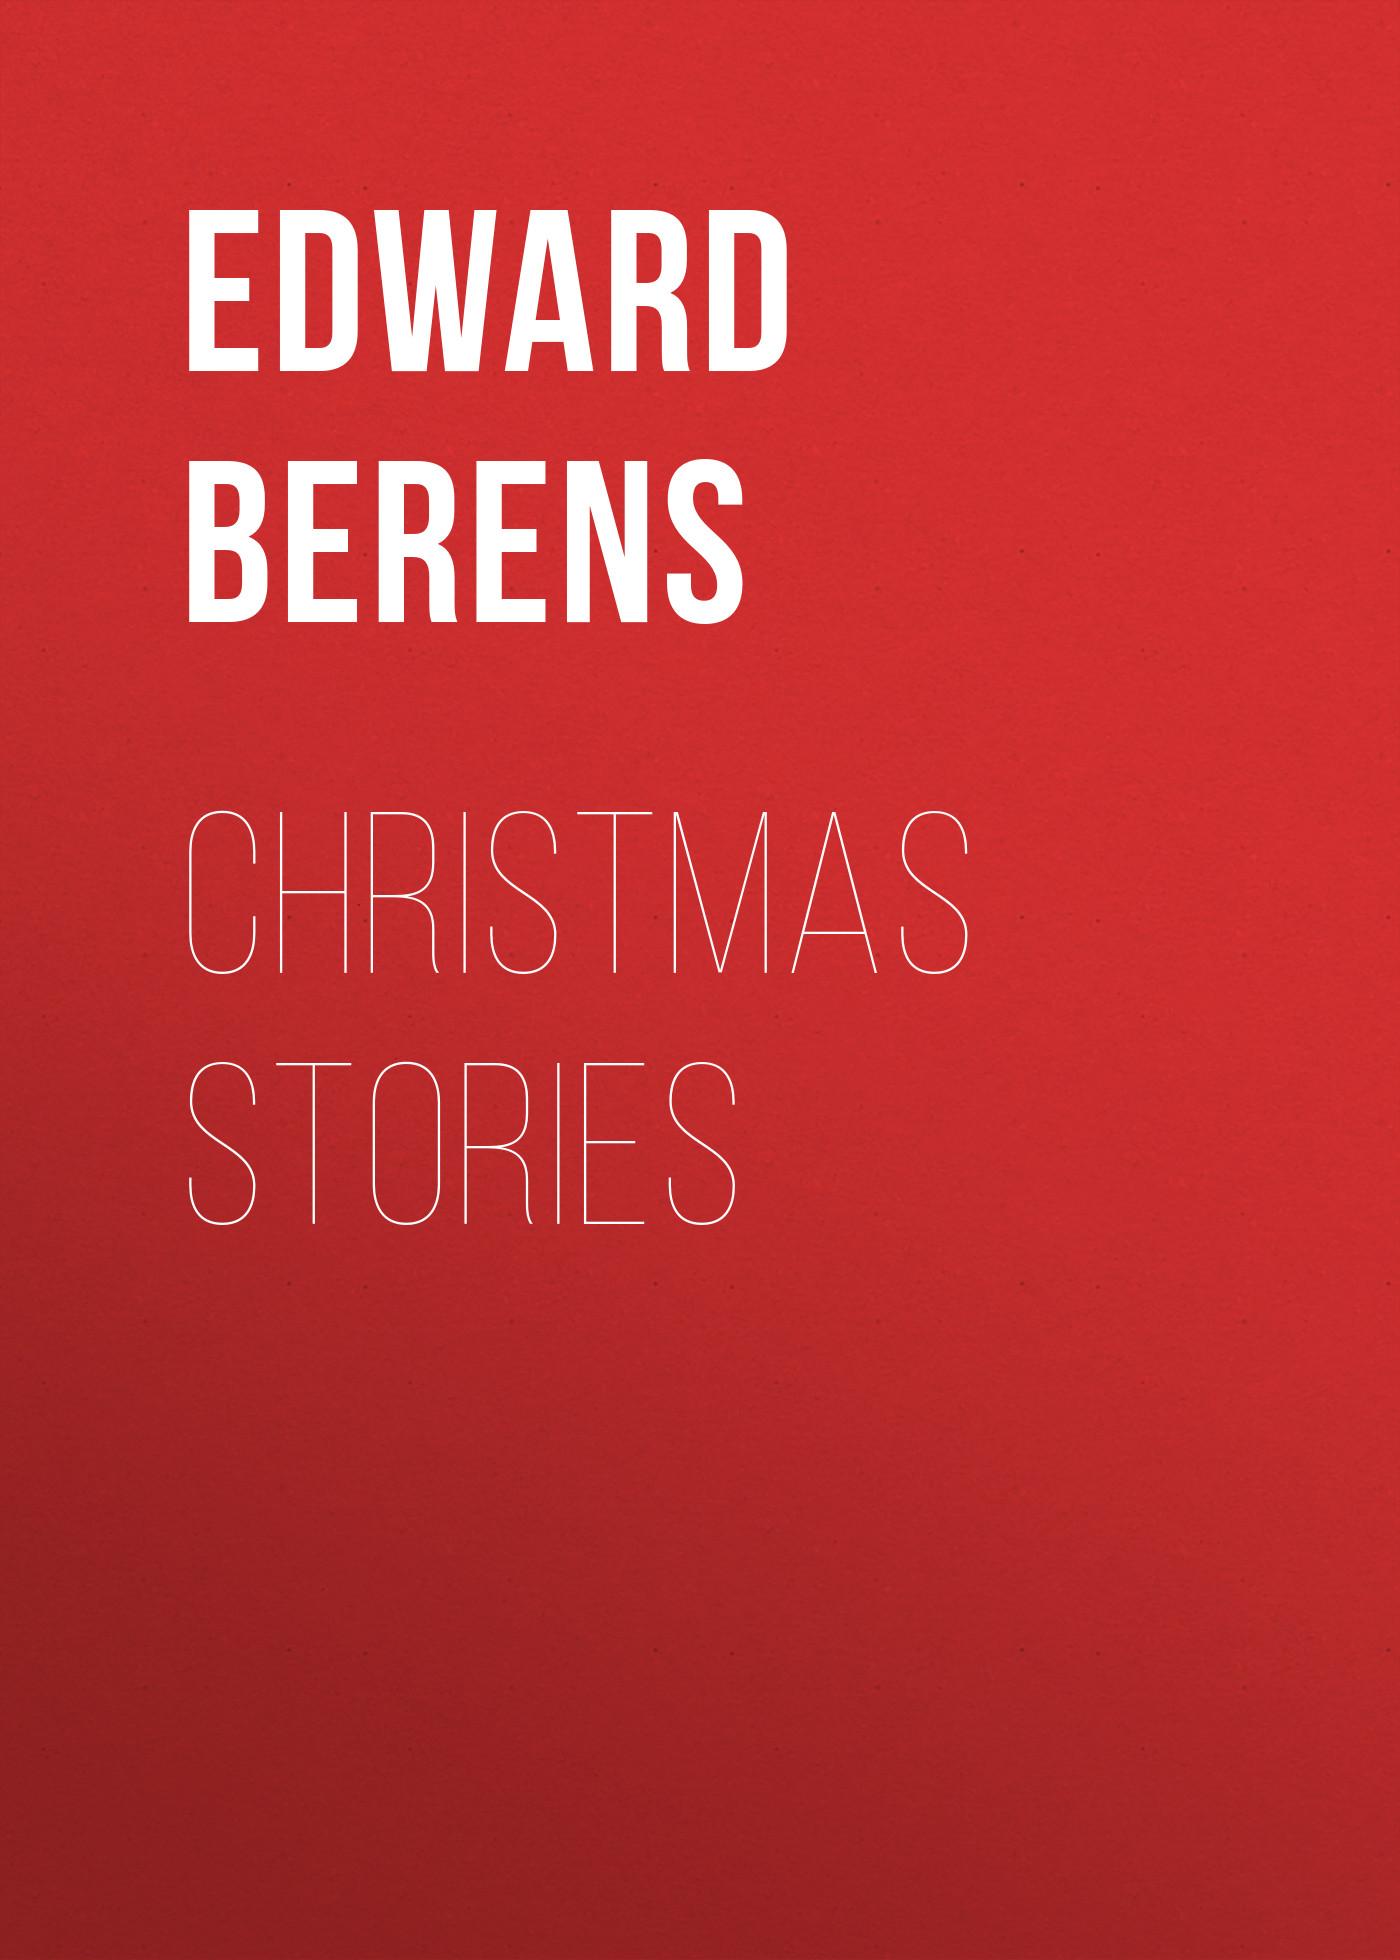 Berens Edward Christmas Stories vitaly mushkin erotic stories top ten